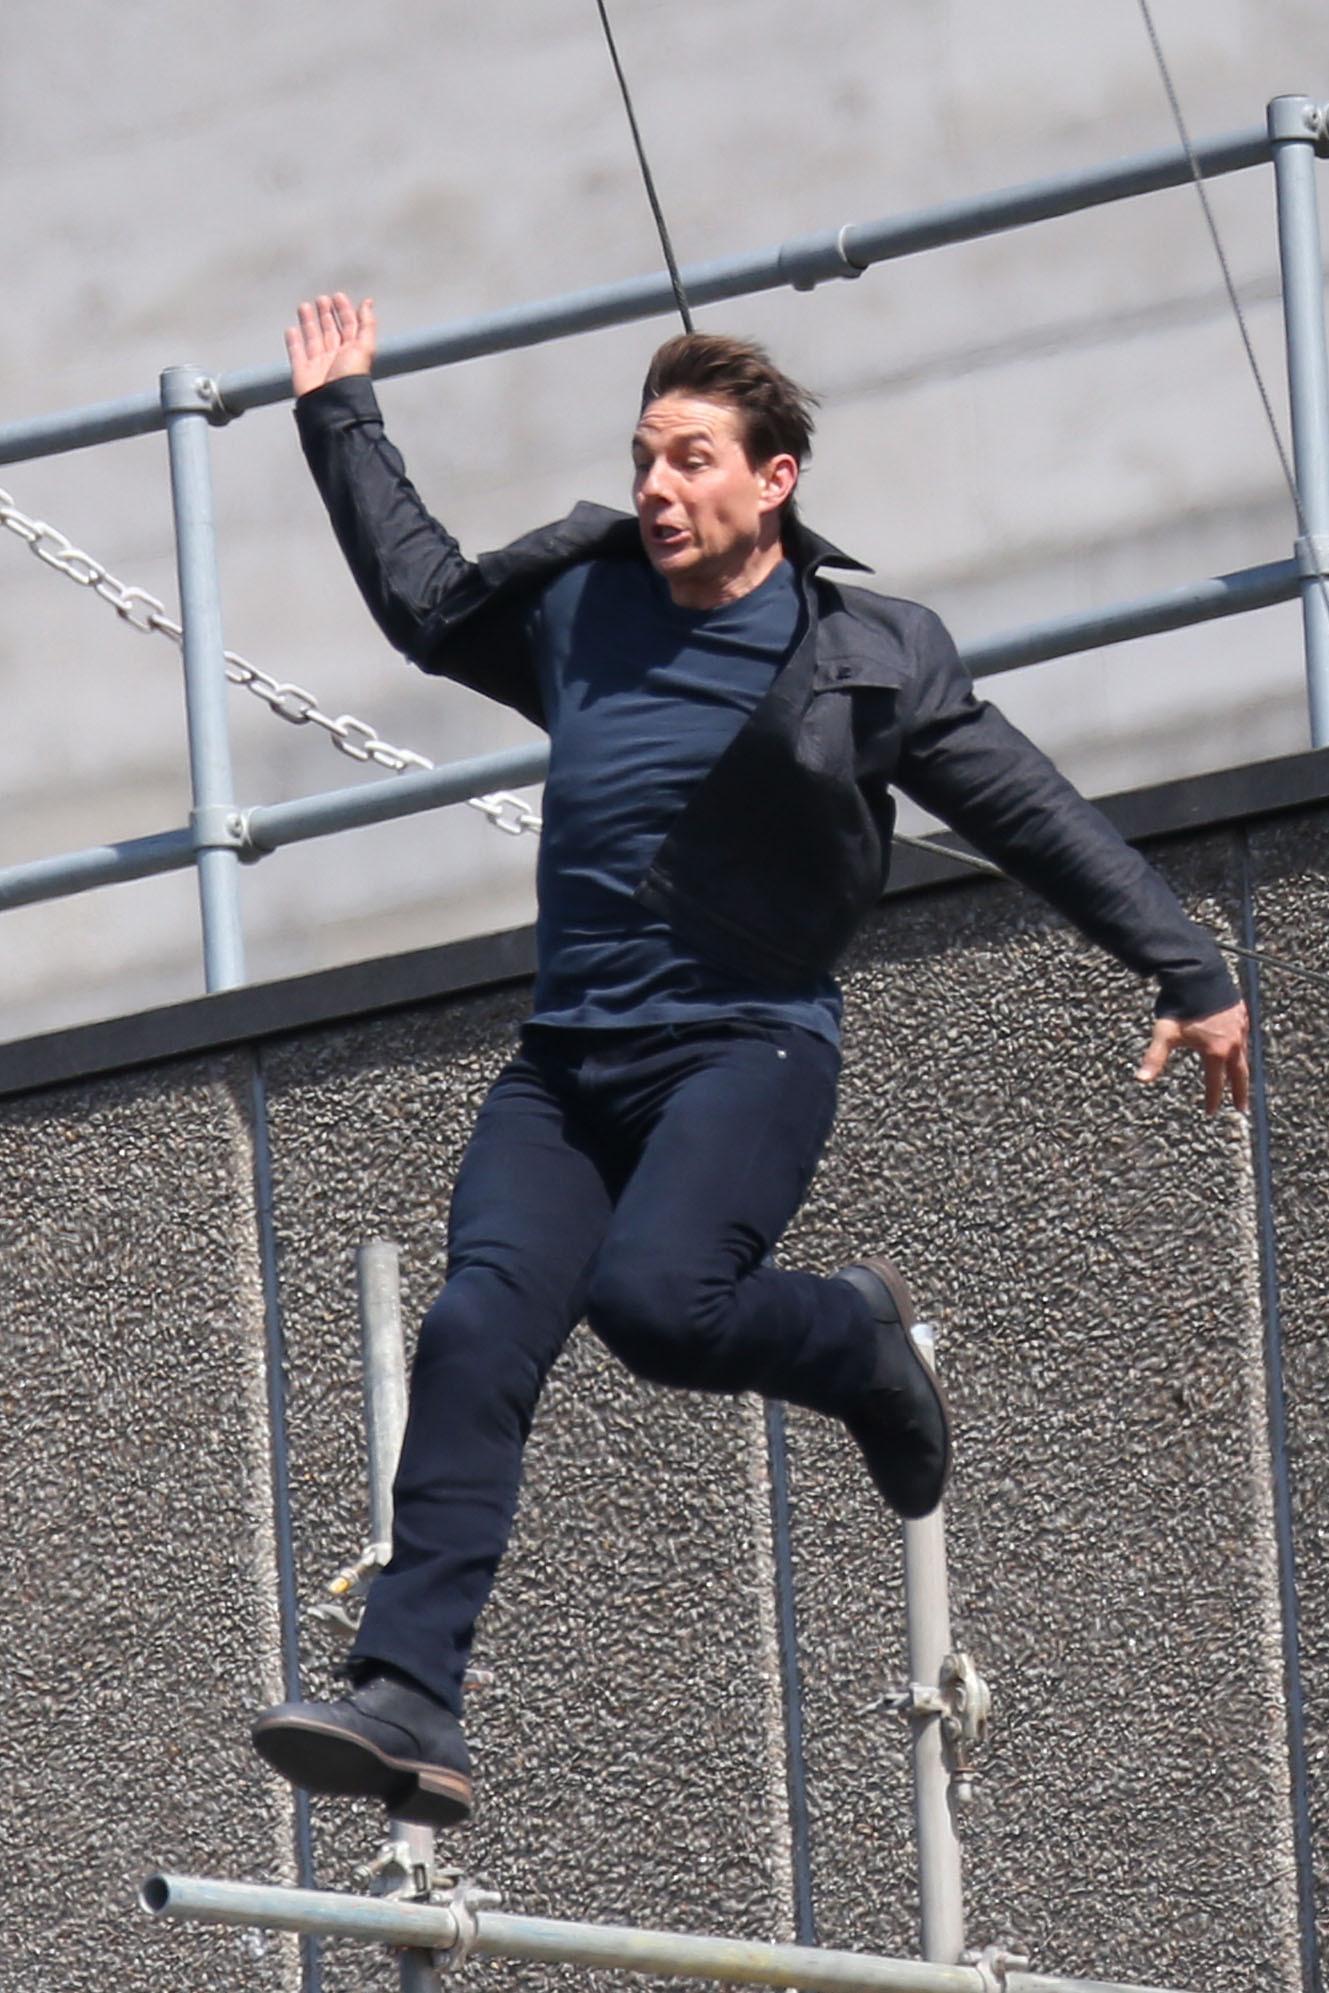 Tom Cruise Mission Impossible Stunt